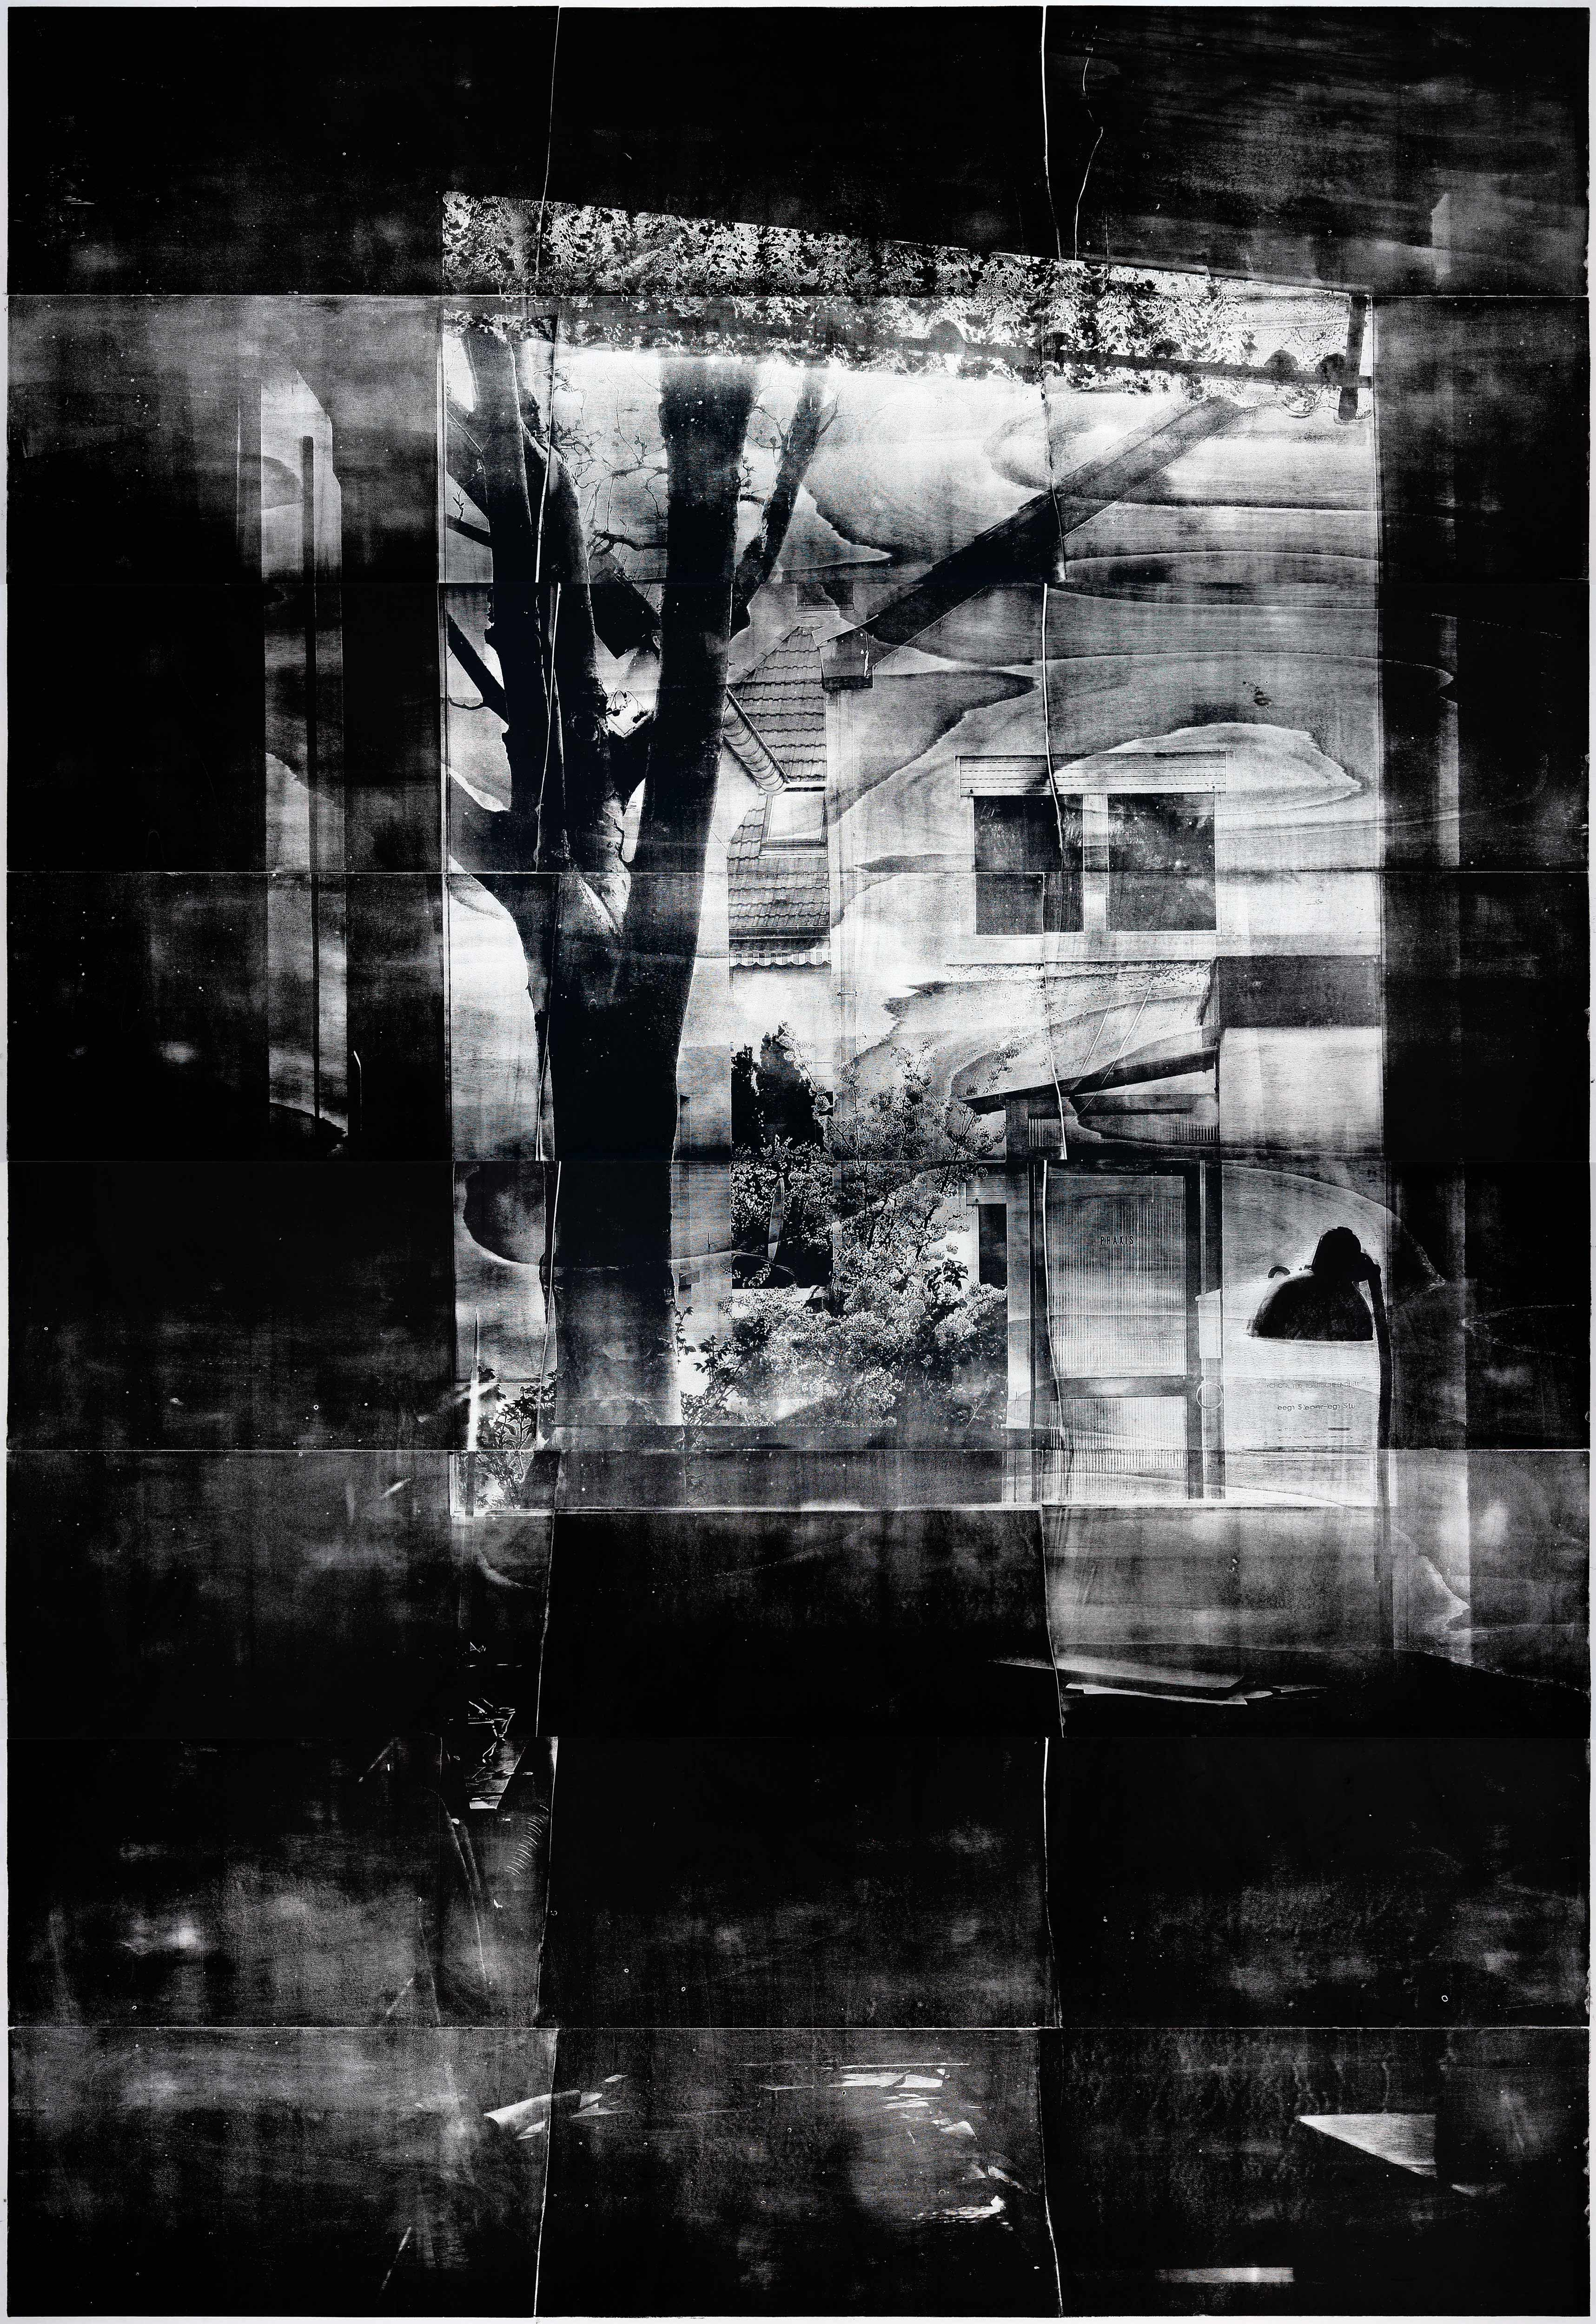 Fenster (Morgen), 2019, wood engraving, 384,4 x 274 cm, Genaro Strobel